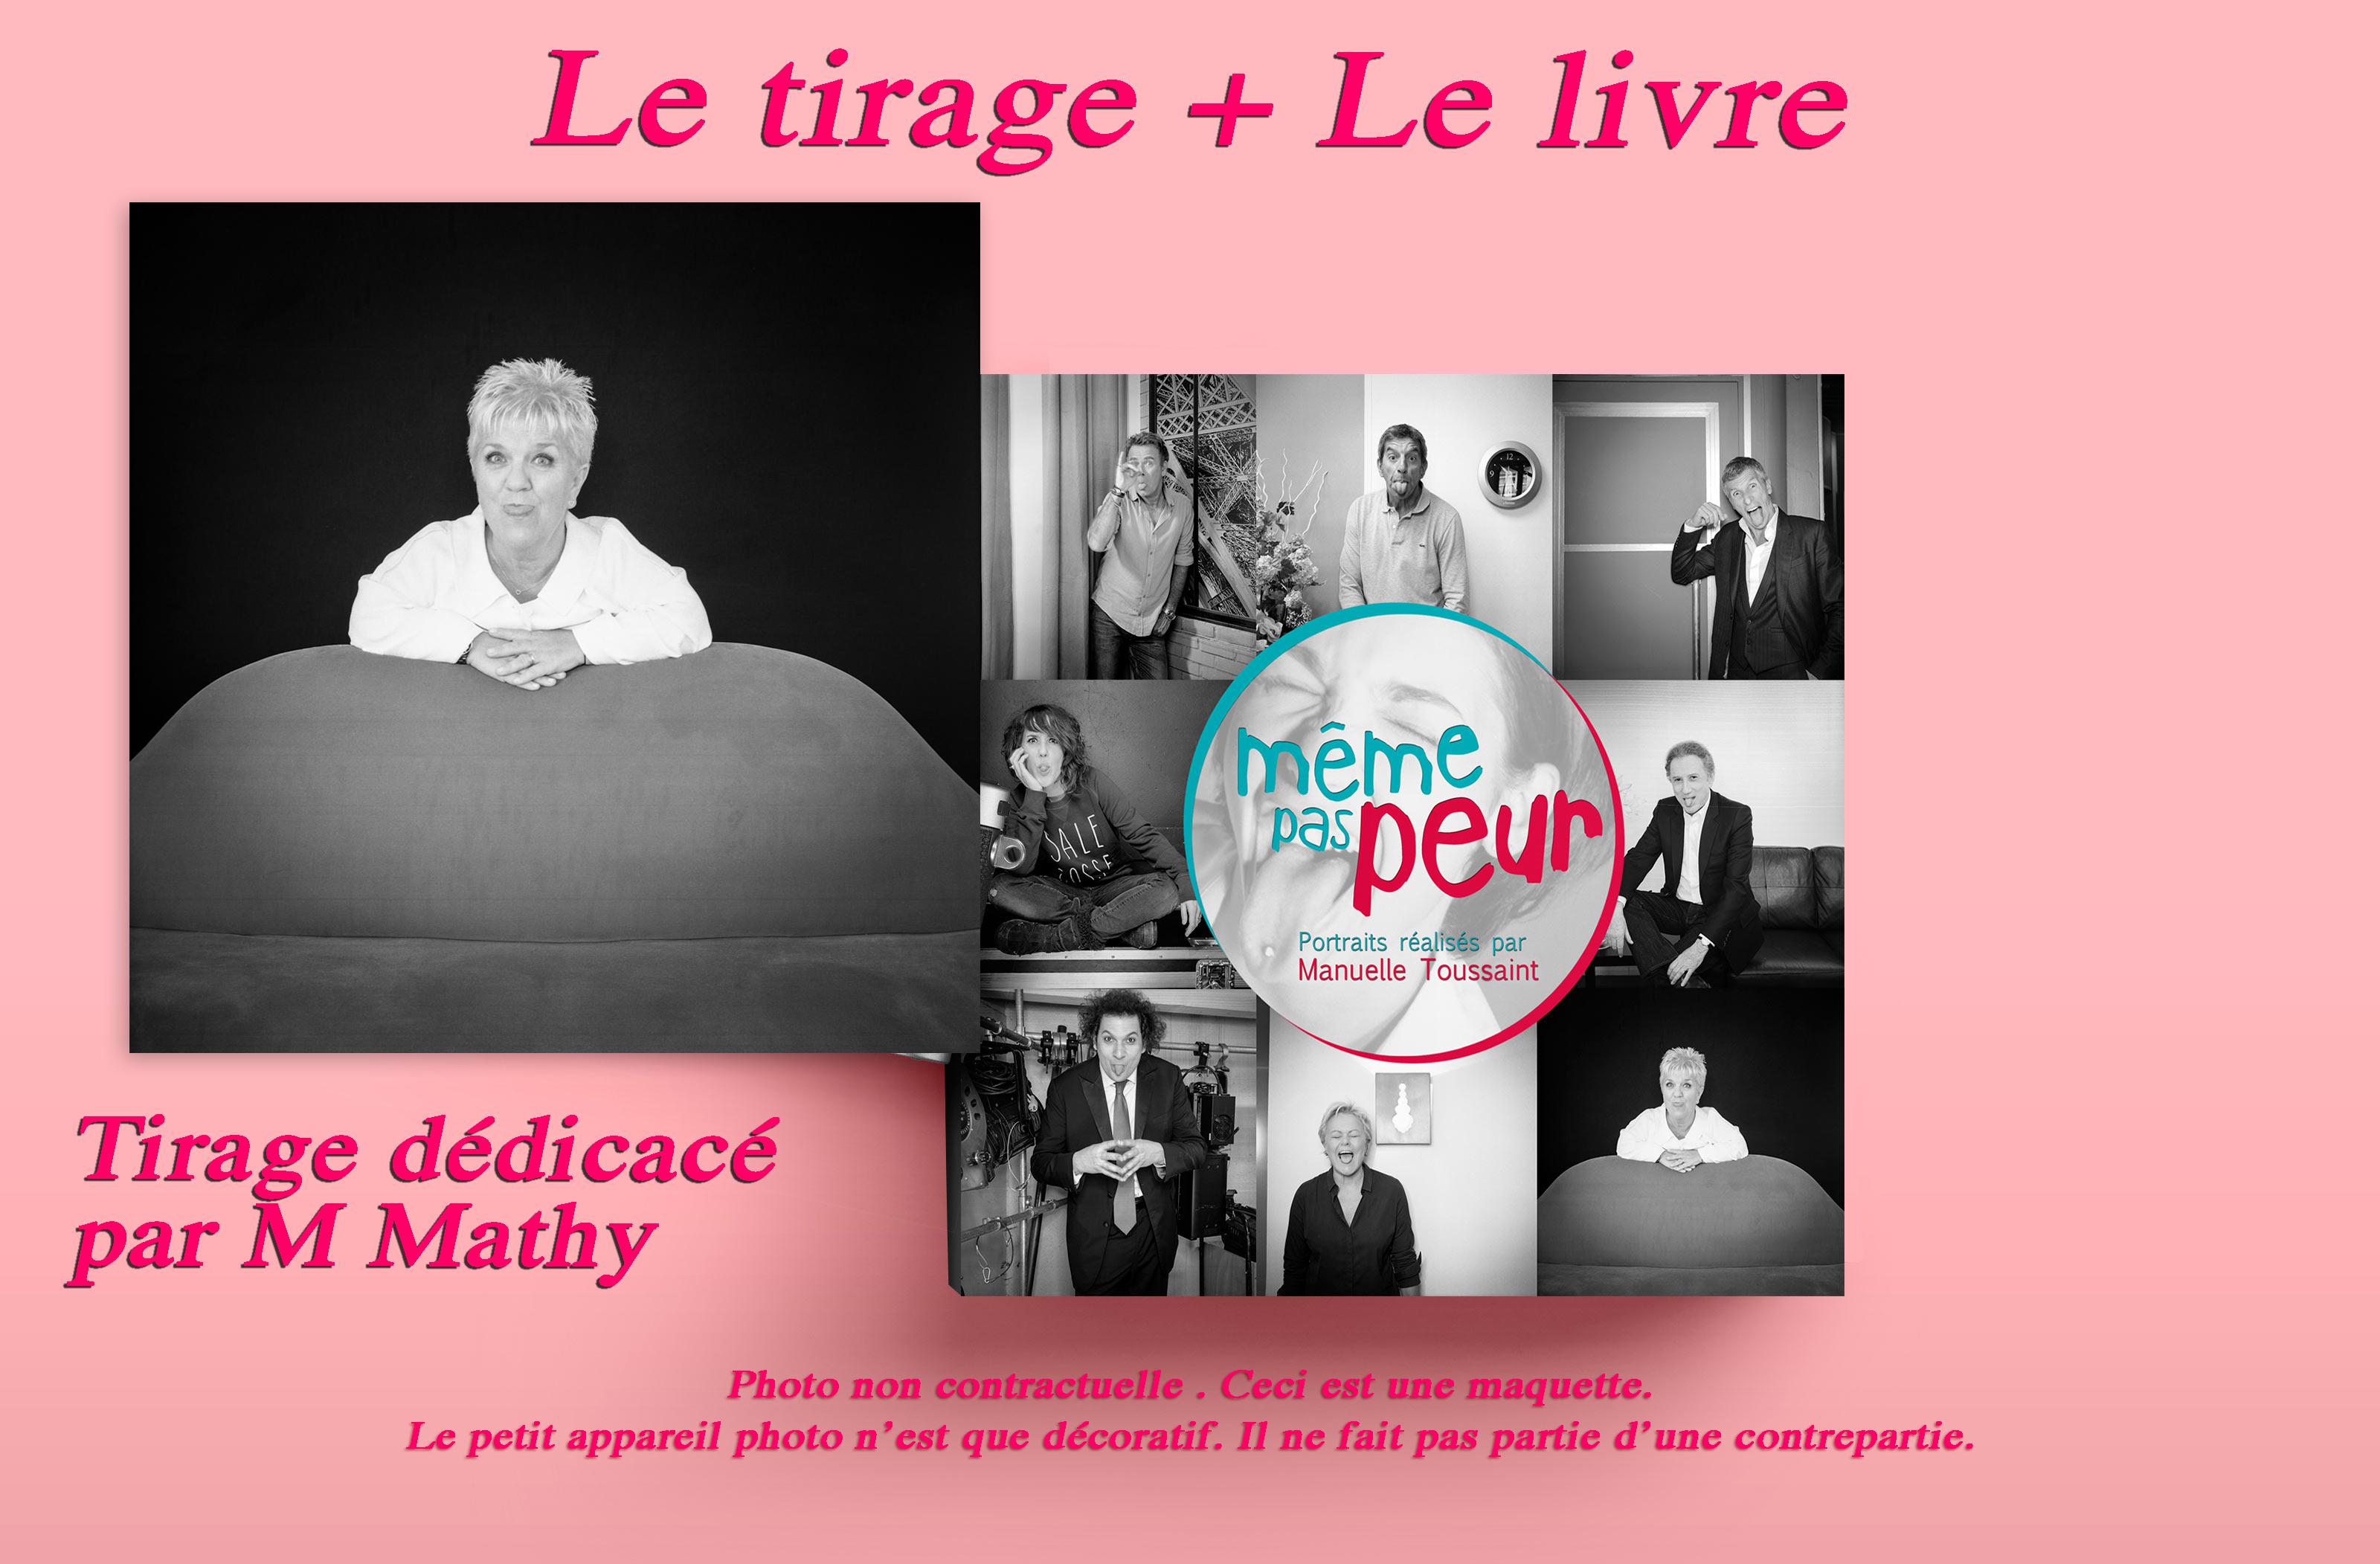 Tirage_dedicace_Mathy_livre-1497101417.jpg